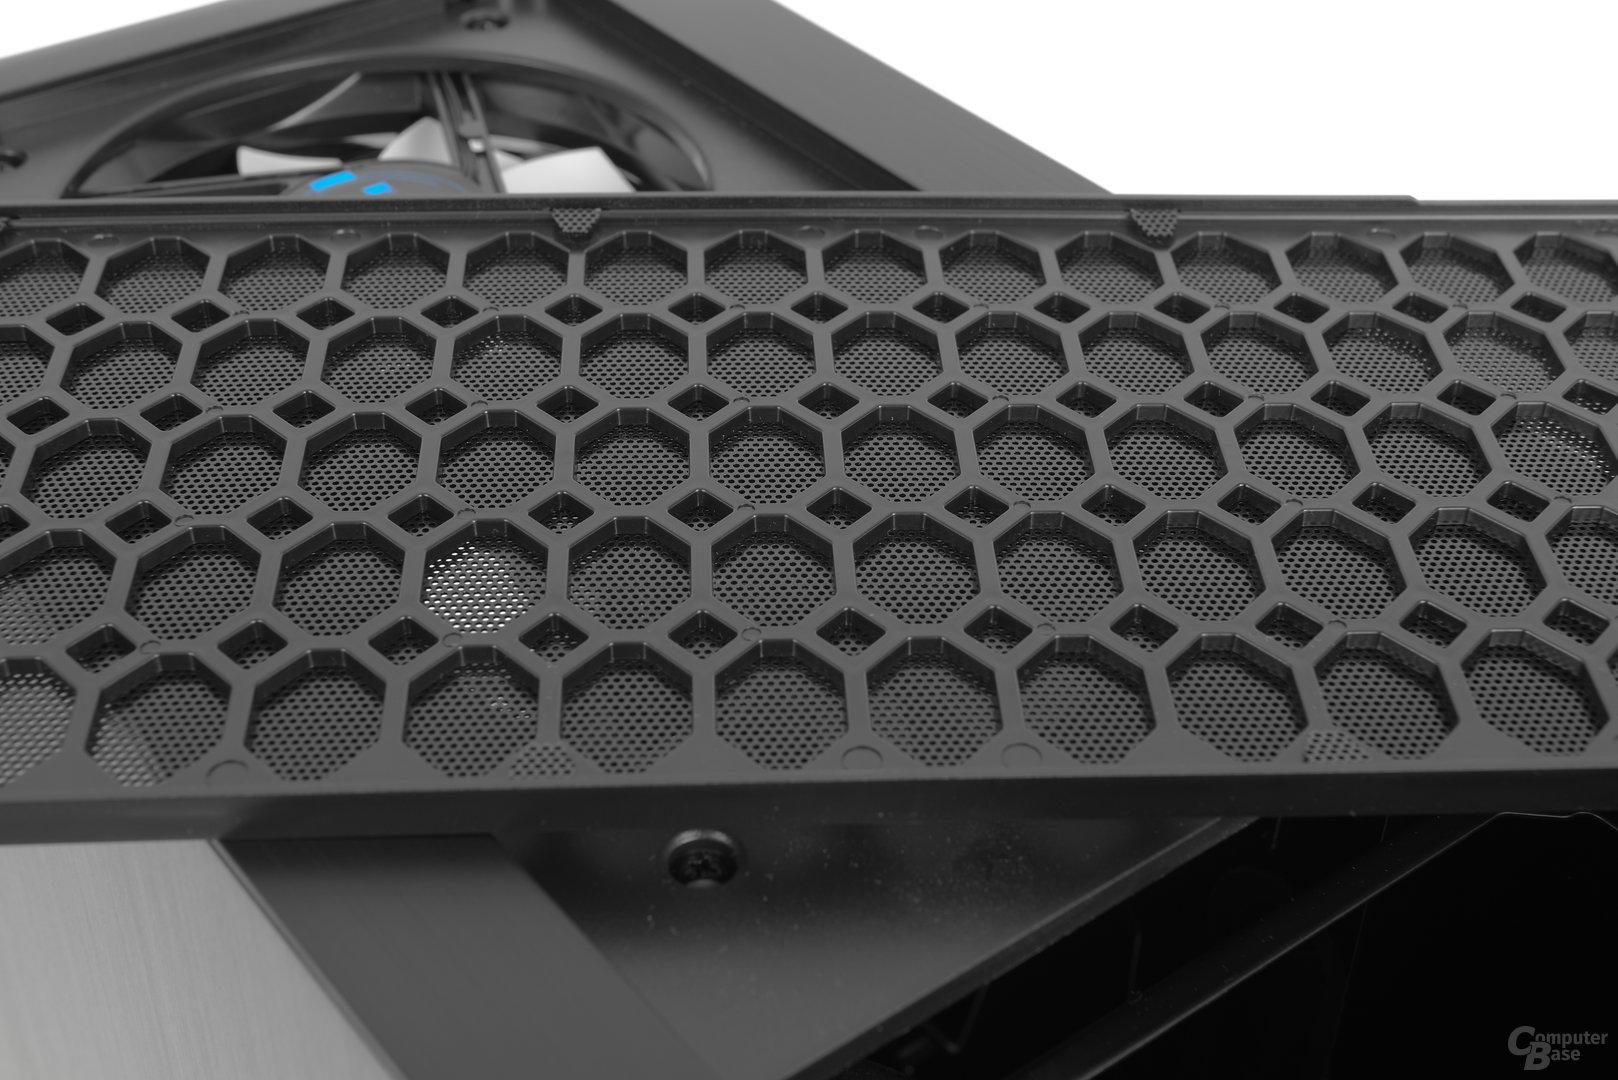 Jonsbo UMX4 – Staubfilter im Detail